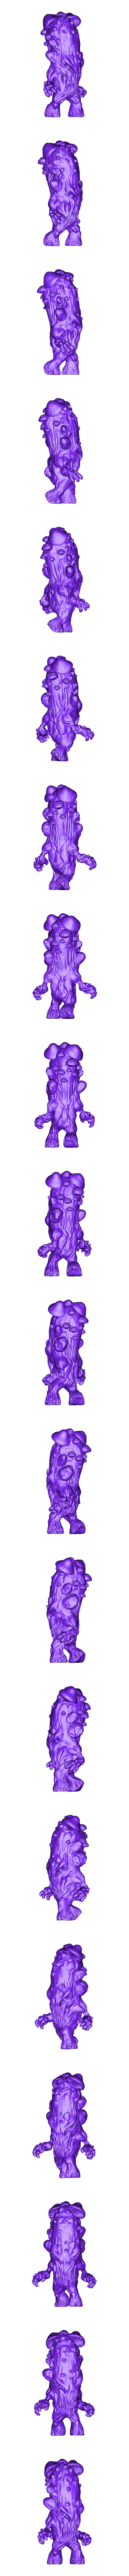 Merged_Mushroom_full.stl Download free STL file Mushroom man • 3D printer design, duncanshadow